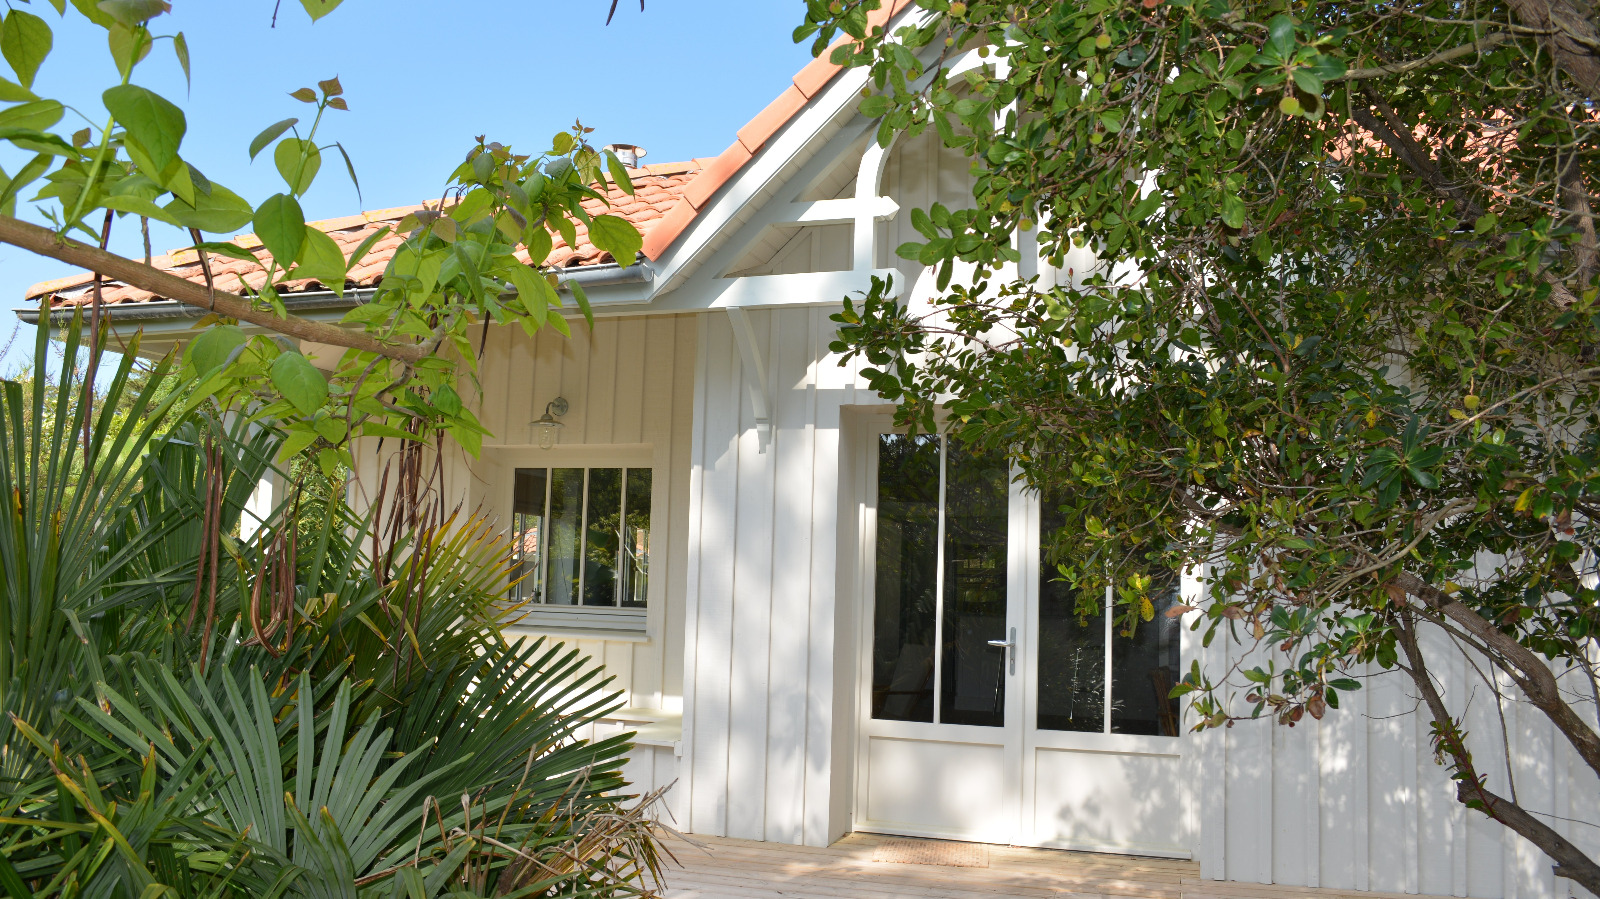 cap ferret 44 hectares villa de style cabane 224 deux pas du bassin immo prestige